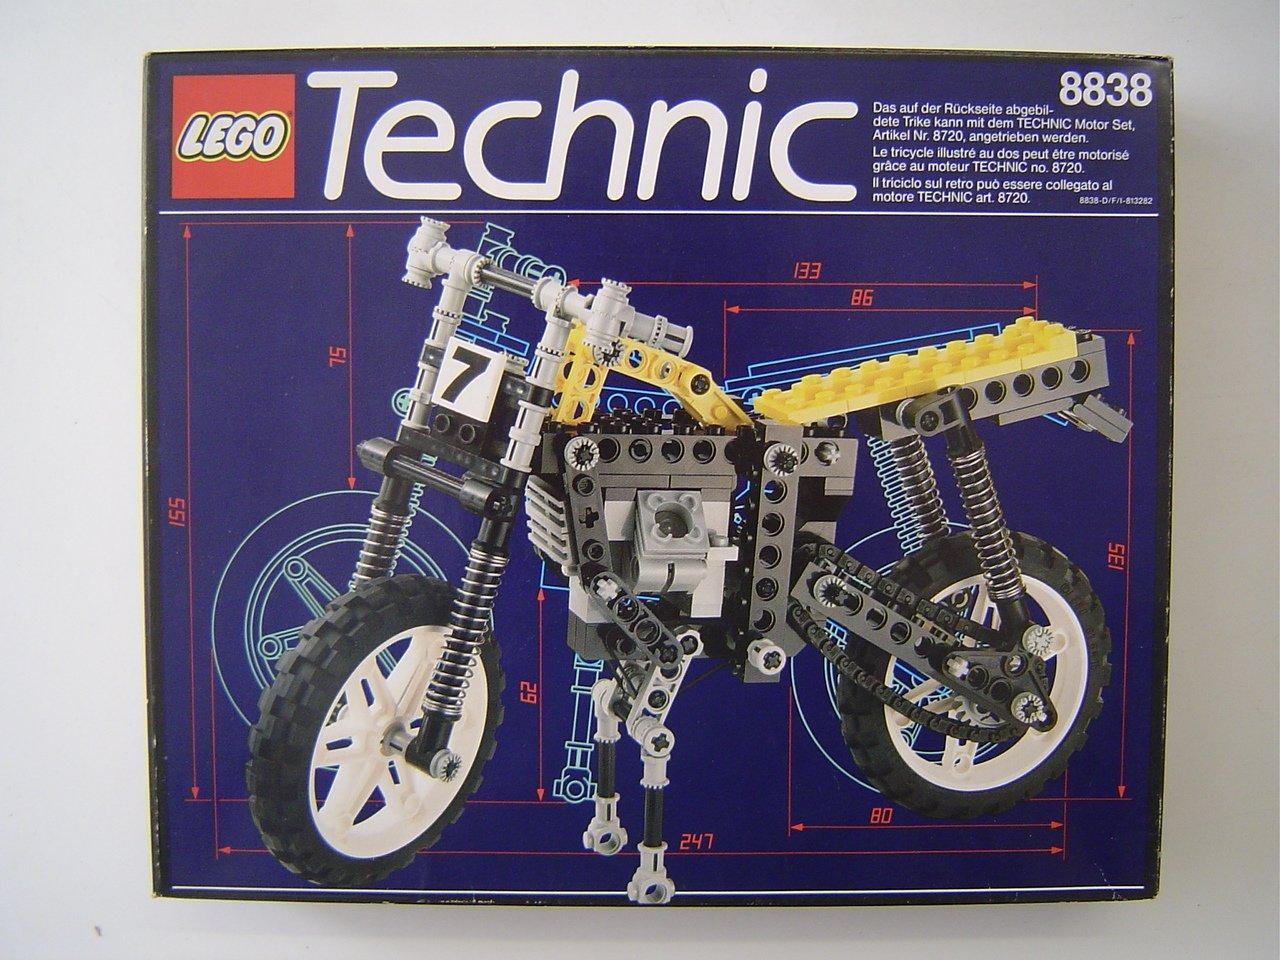 LEGO TECHNIC 8838 Enduro online bestellen